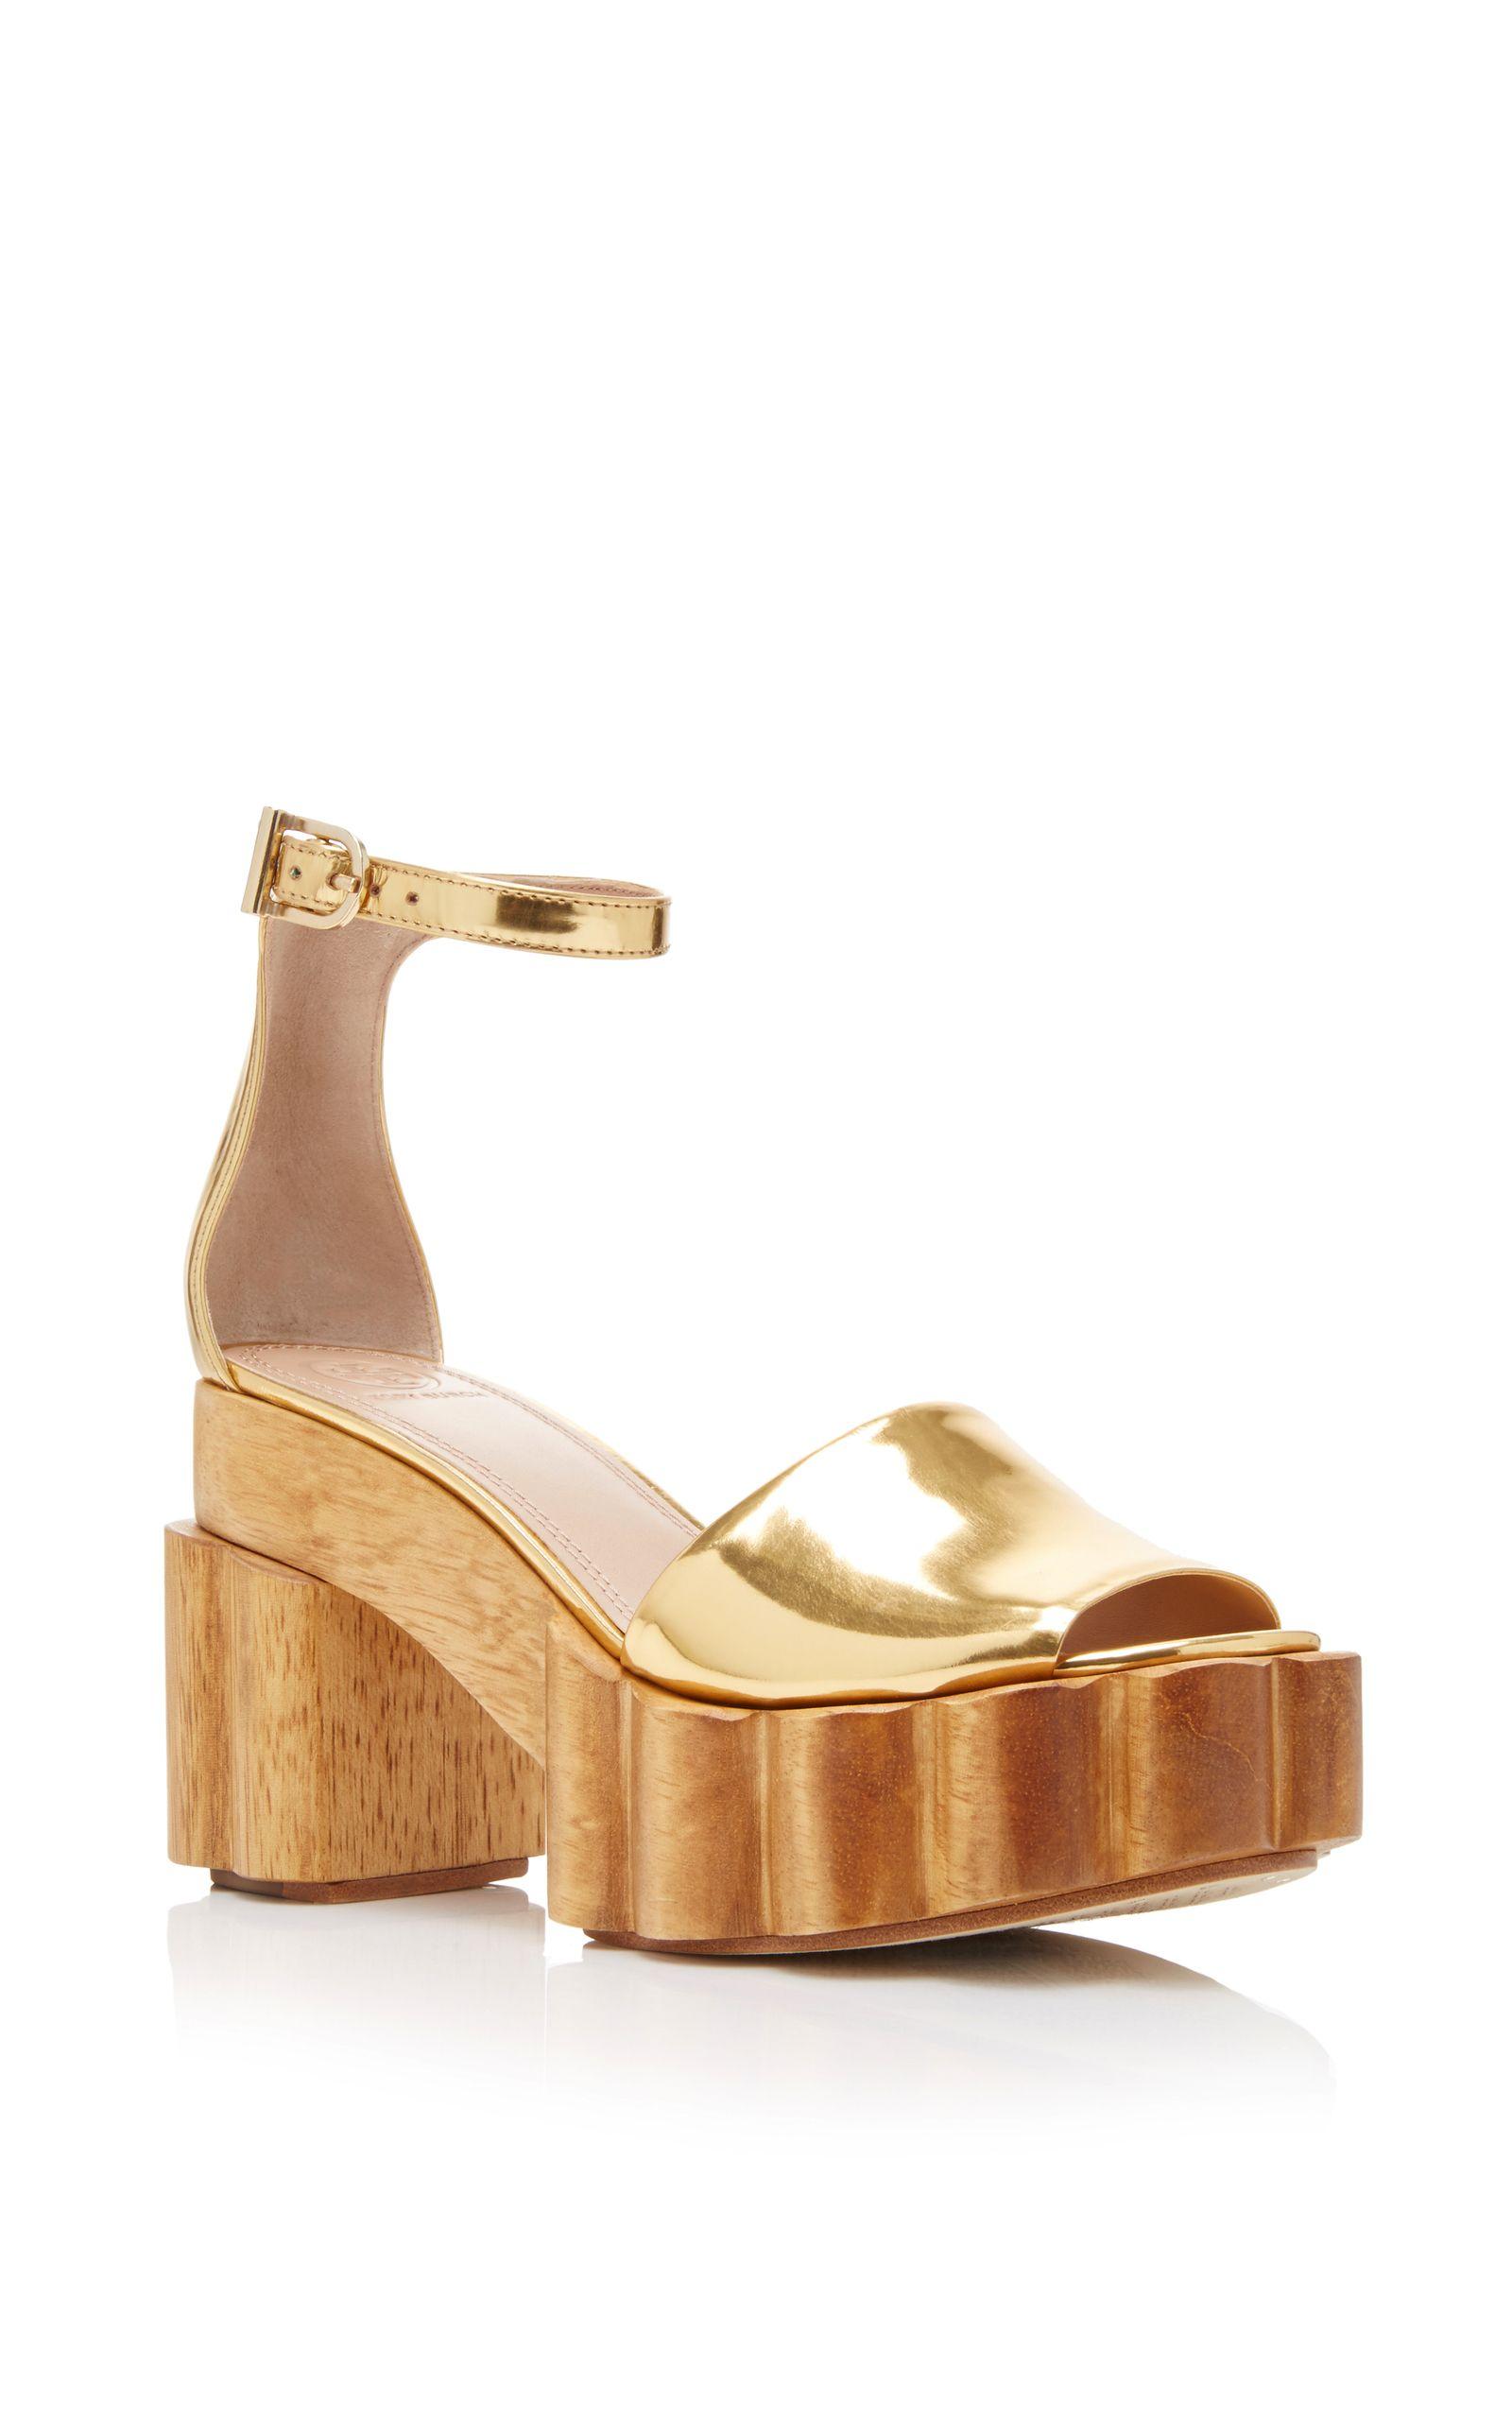 Tory Burch Metallic Platform Sandals discount top quality outlet cheap quality sneakernews cheap online cheap sast 4bV2urnIj